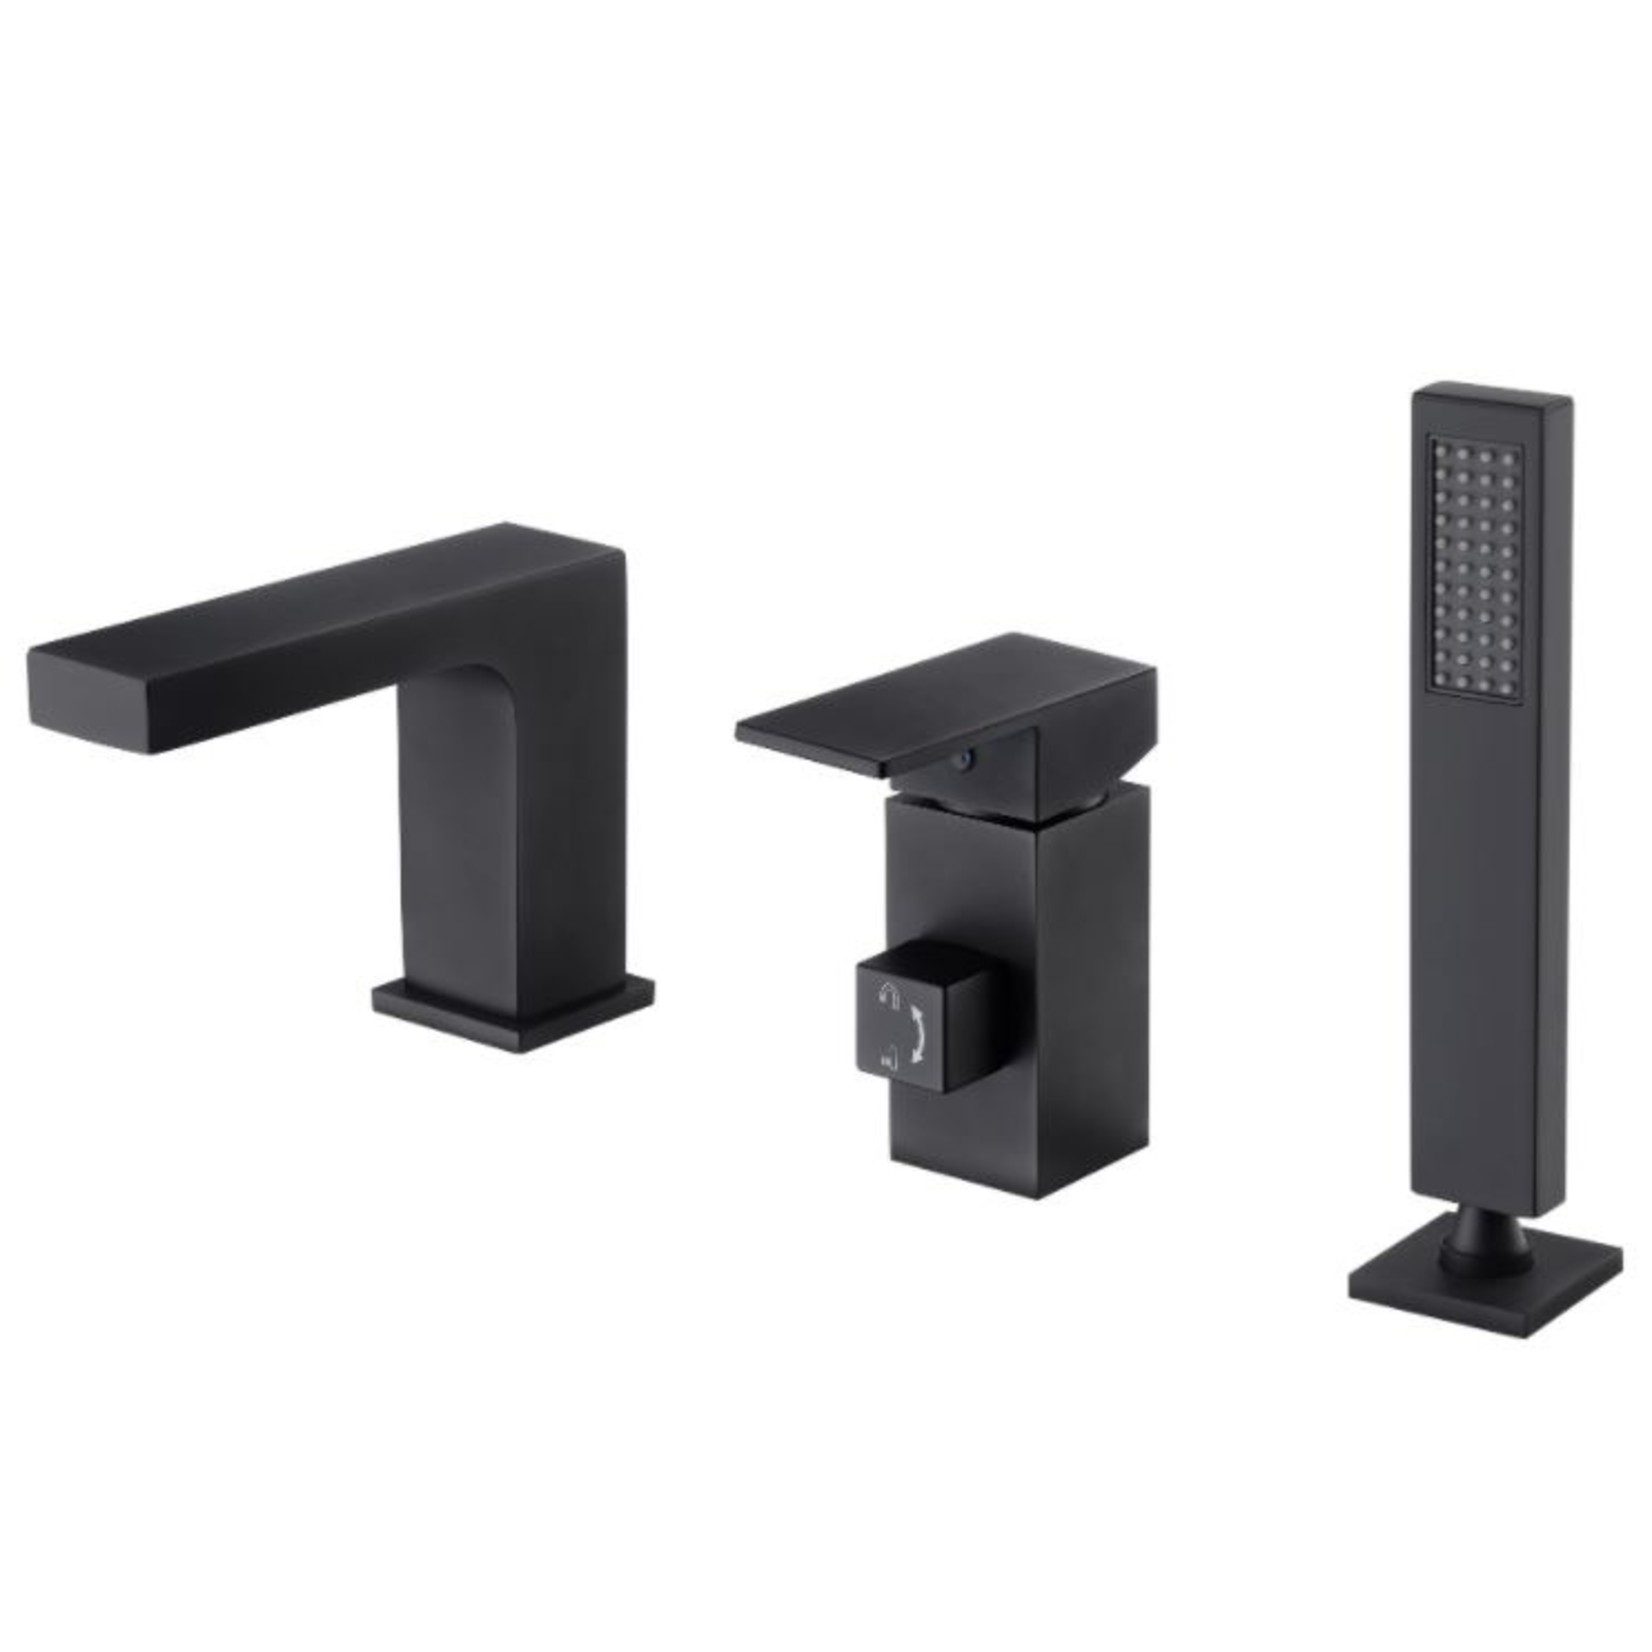 Robinet de bain romain noir MN-3821-03